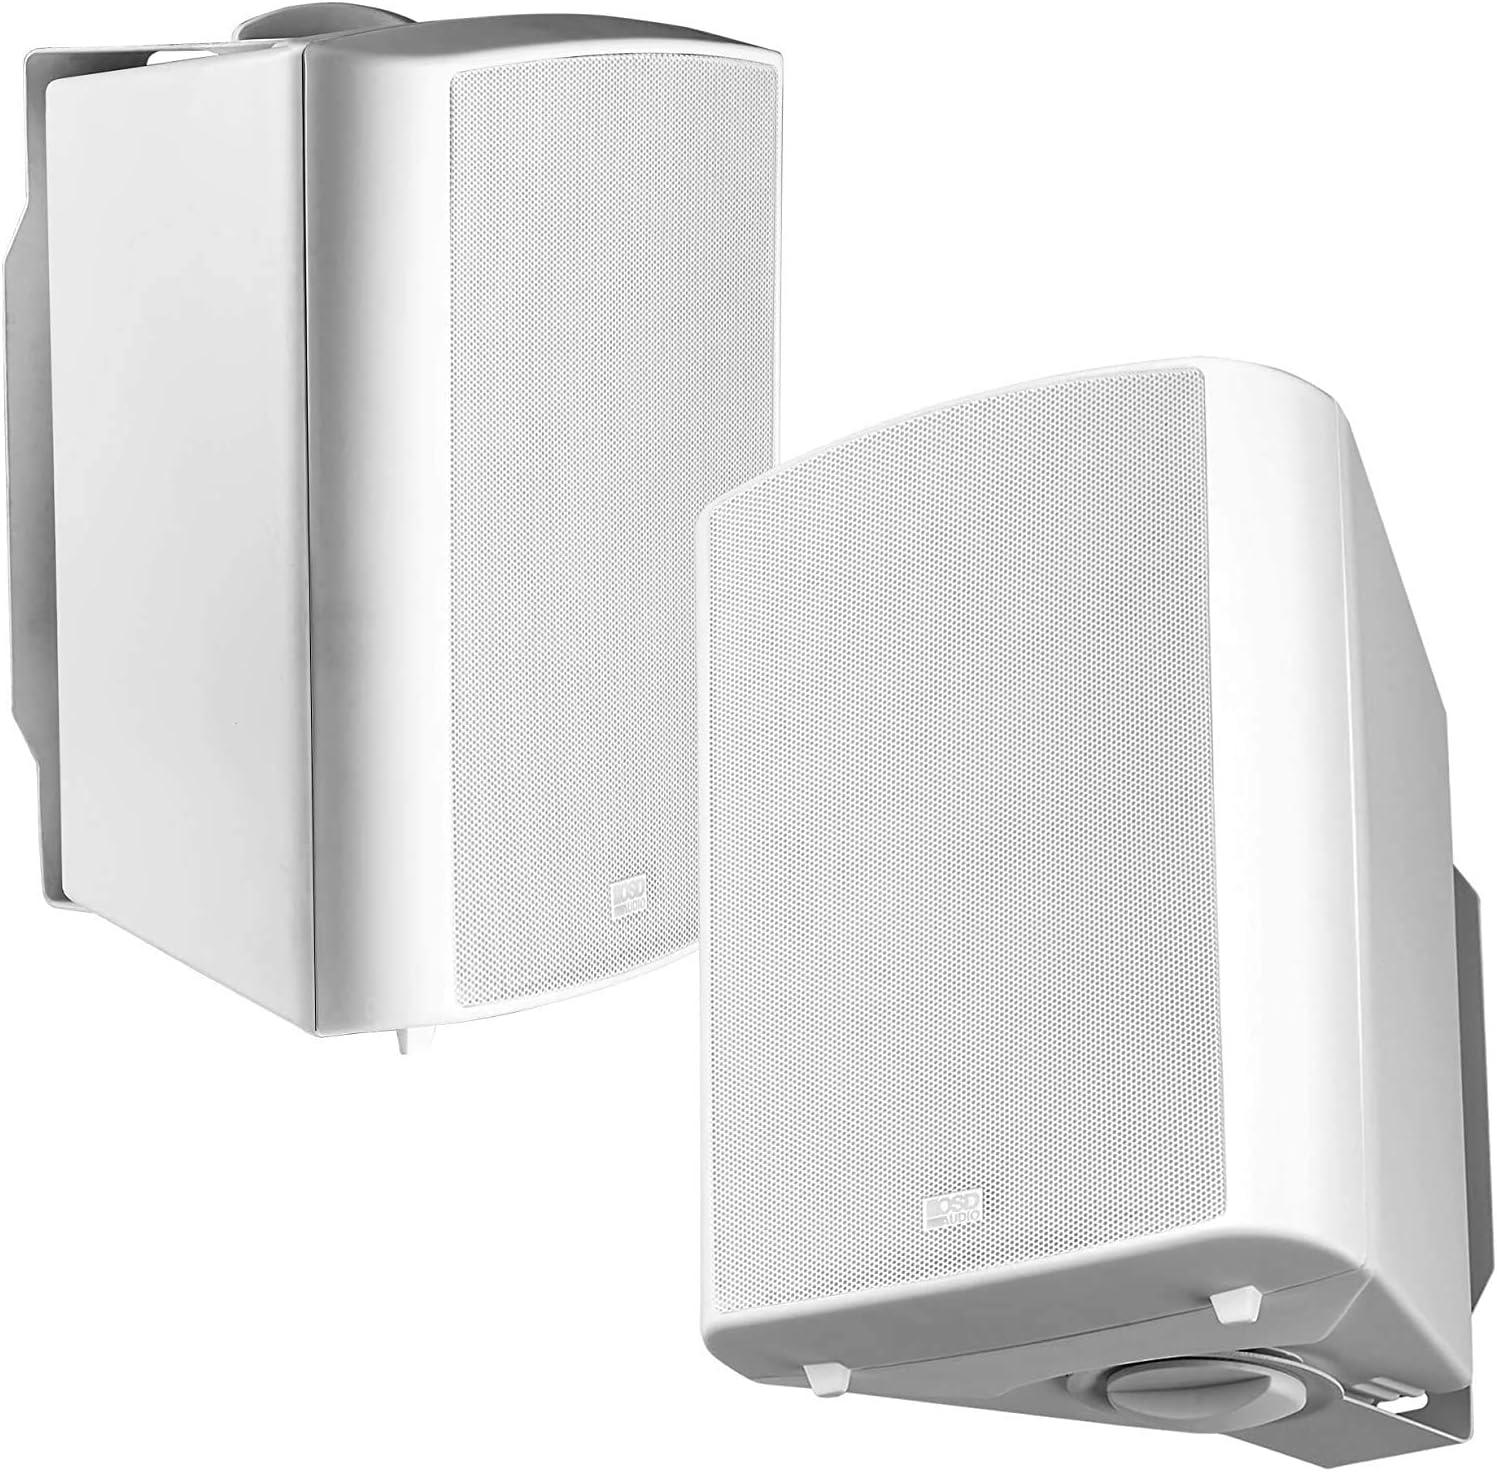 "OSD Audio 70V Commercial 5.25"" Patio Speaker Indoor Outdoor Pair White AP520T"